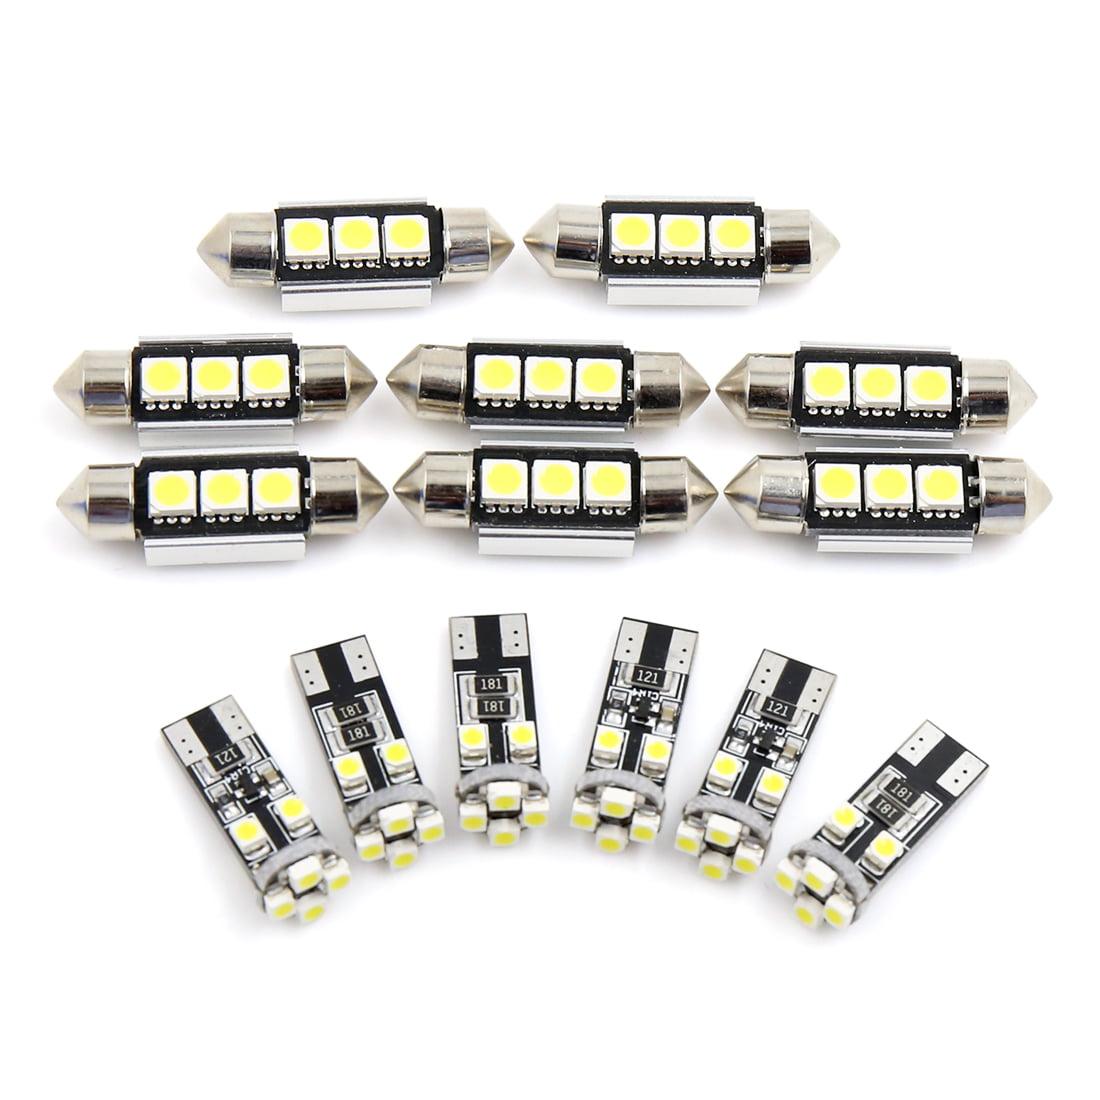 AUDI A6 C7 2012 ERROR FREE WHITE INTERIOR COMPLETE LED BULBS UPGRADE LIGHT SET